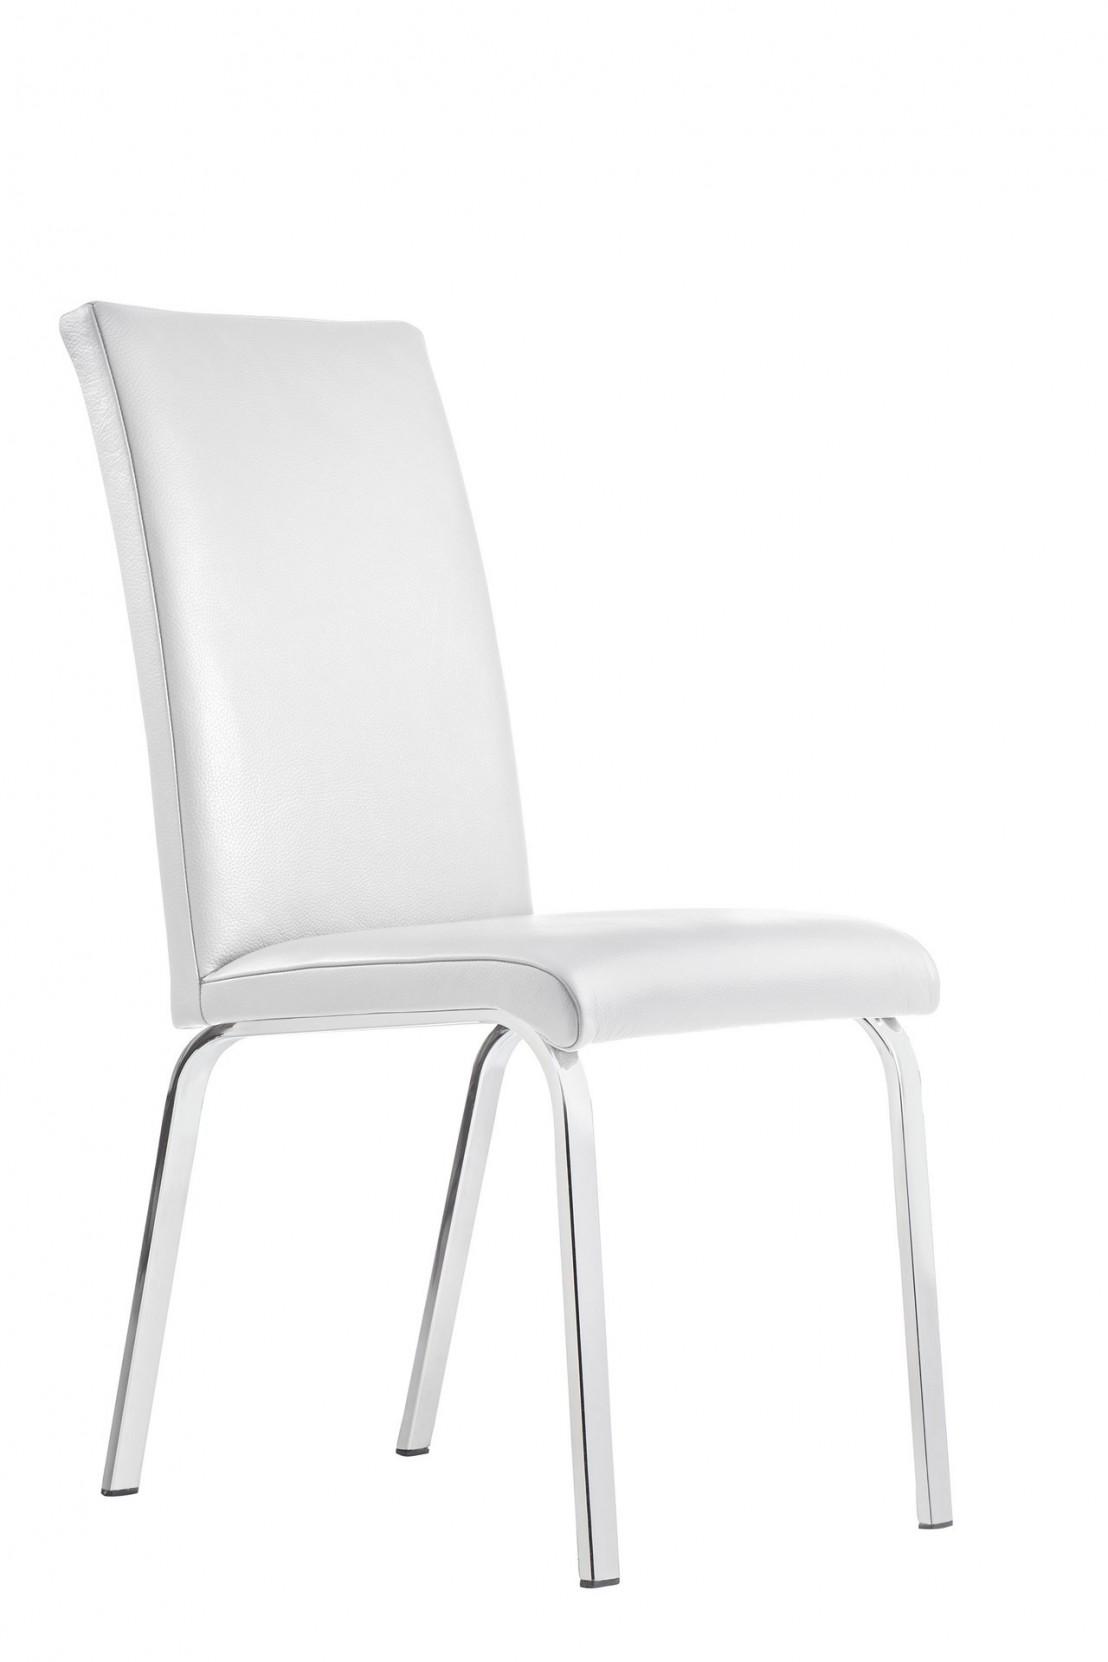 Chaises design lofty m 4 pieds ou luge cuir ou tissu for Chaise 4 pieds design